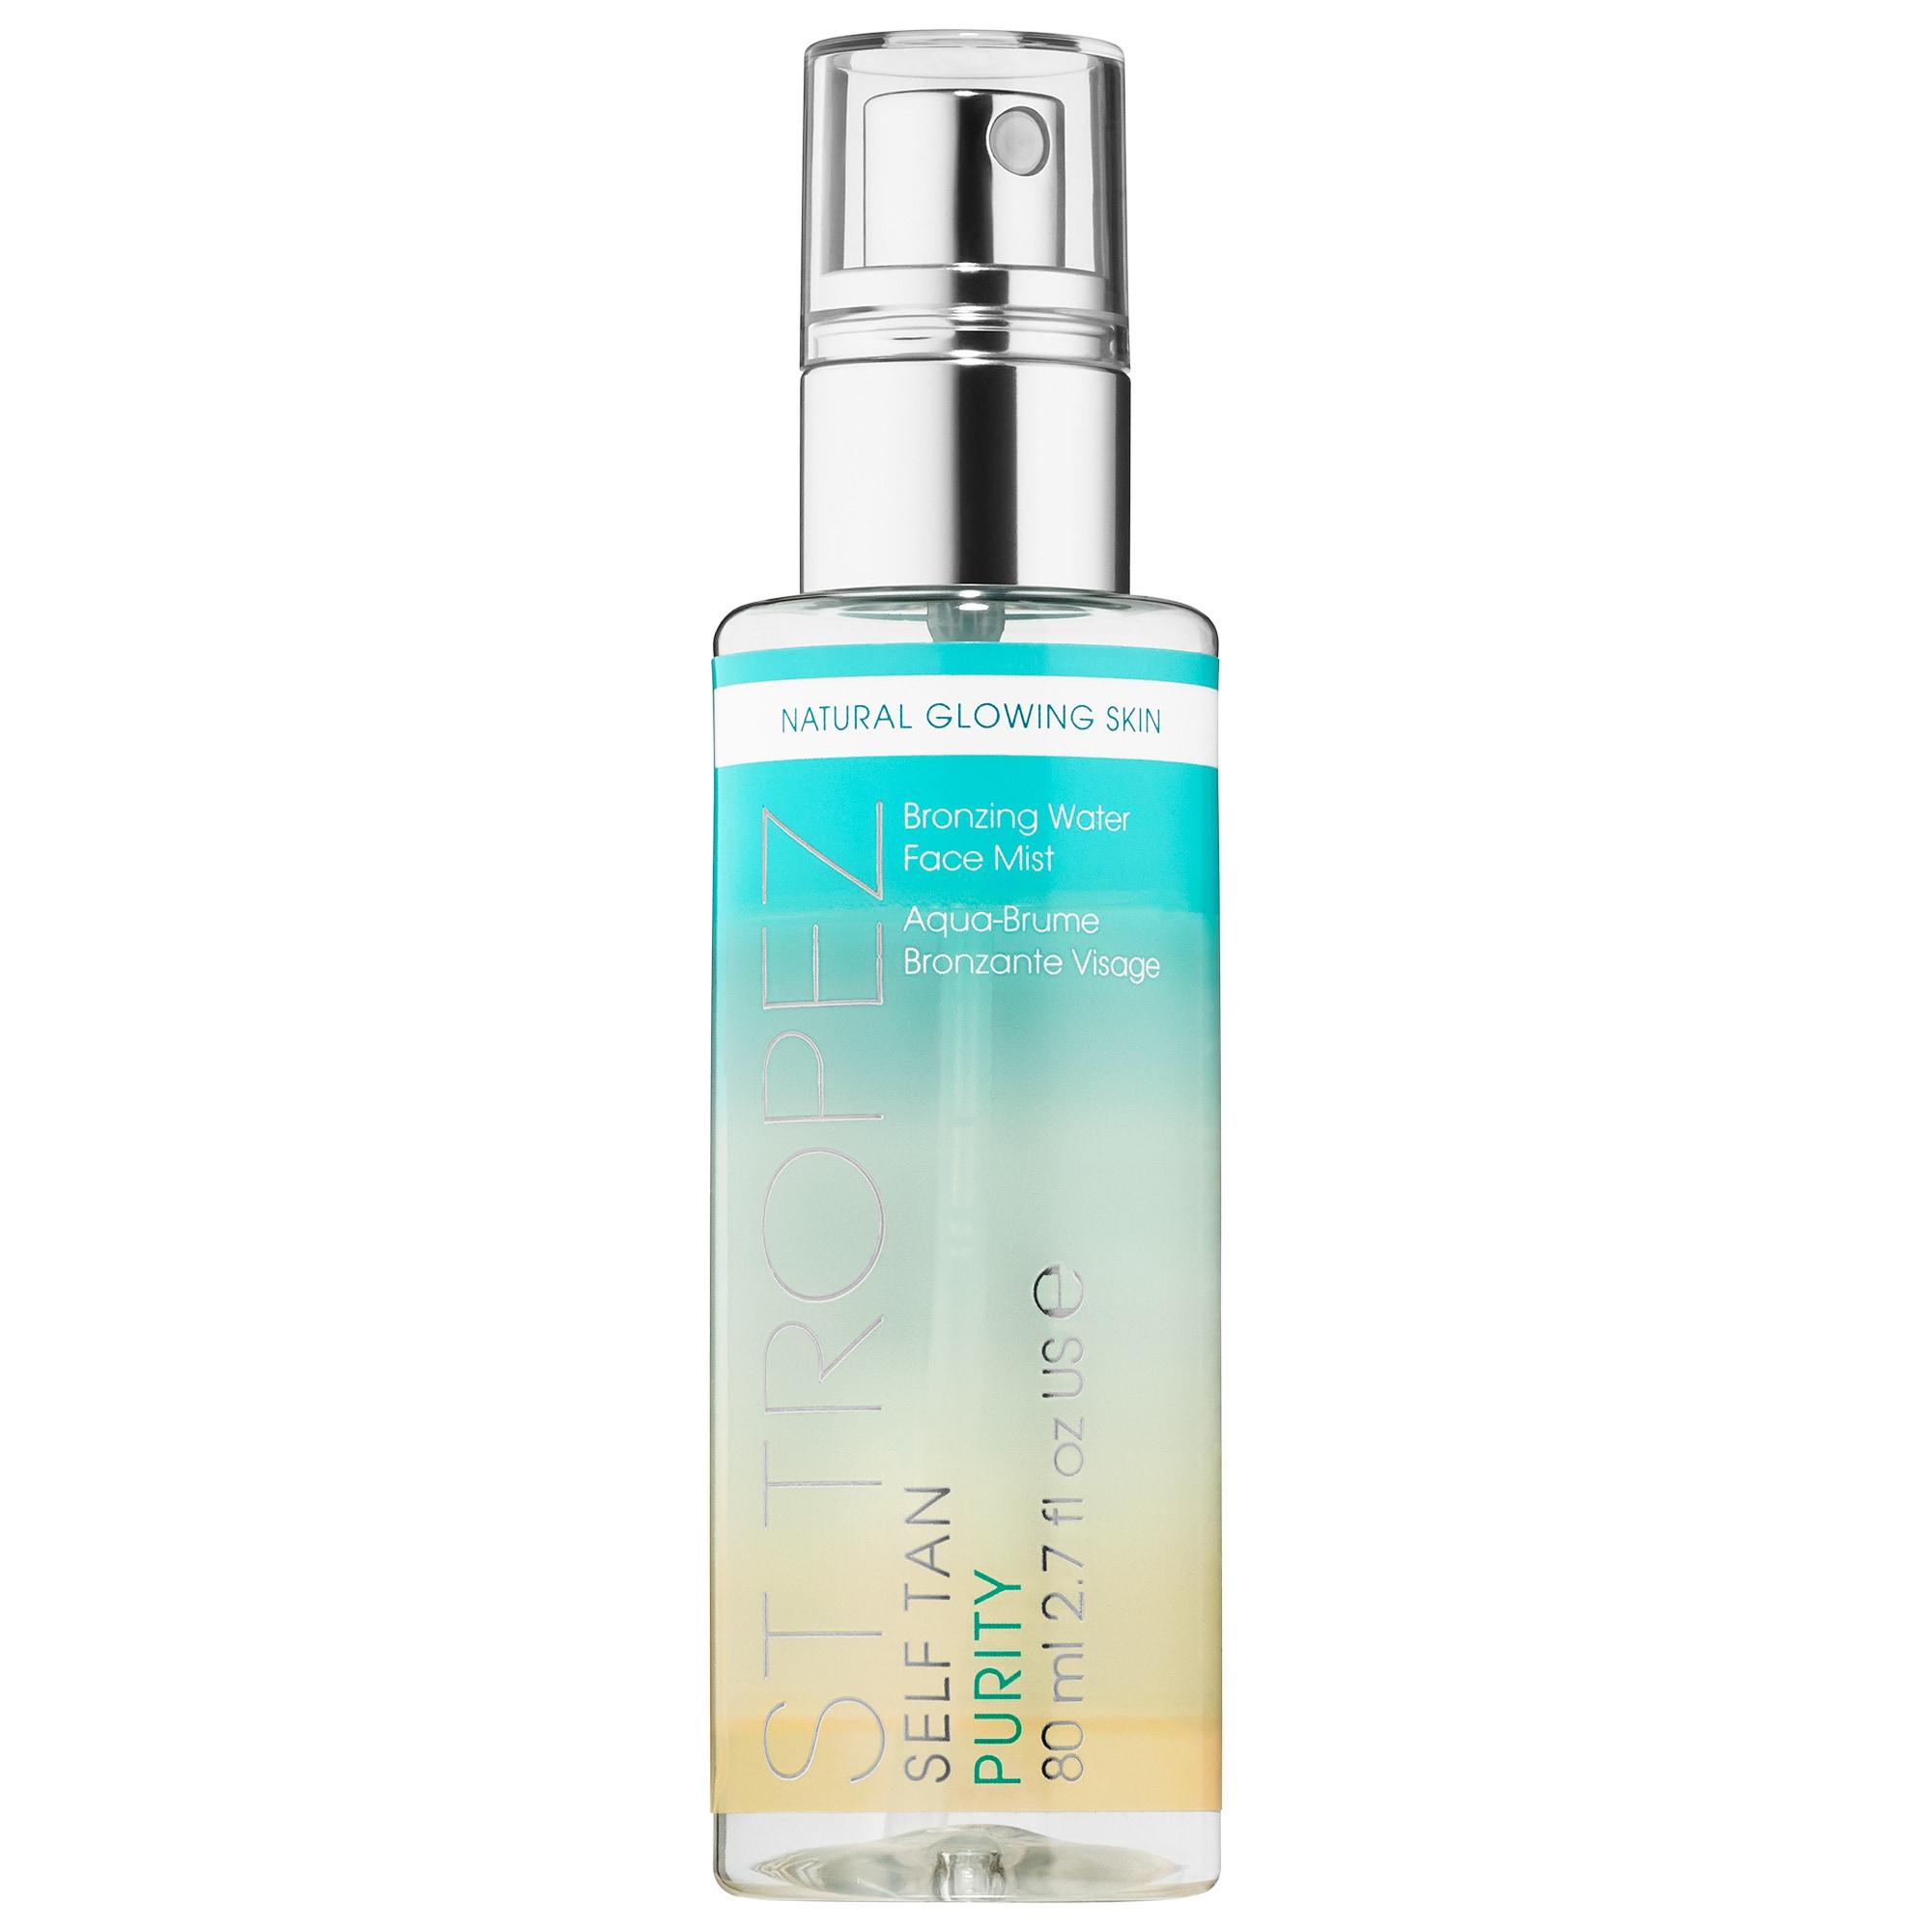 St. Tropez Tanning Essentials - Self Tan Purity Bronzing Water Face Mist